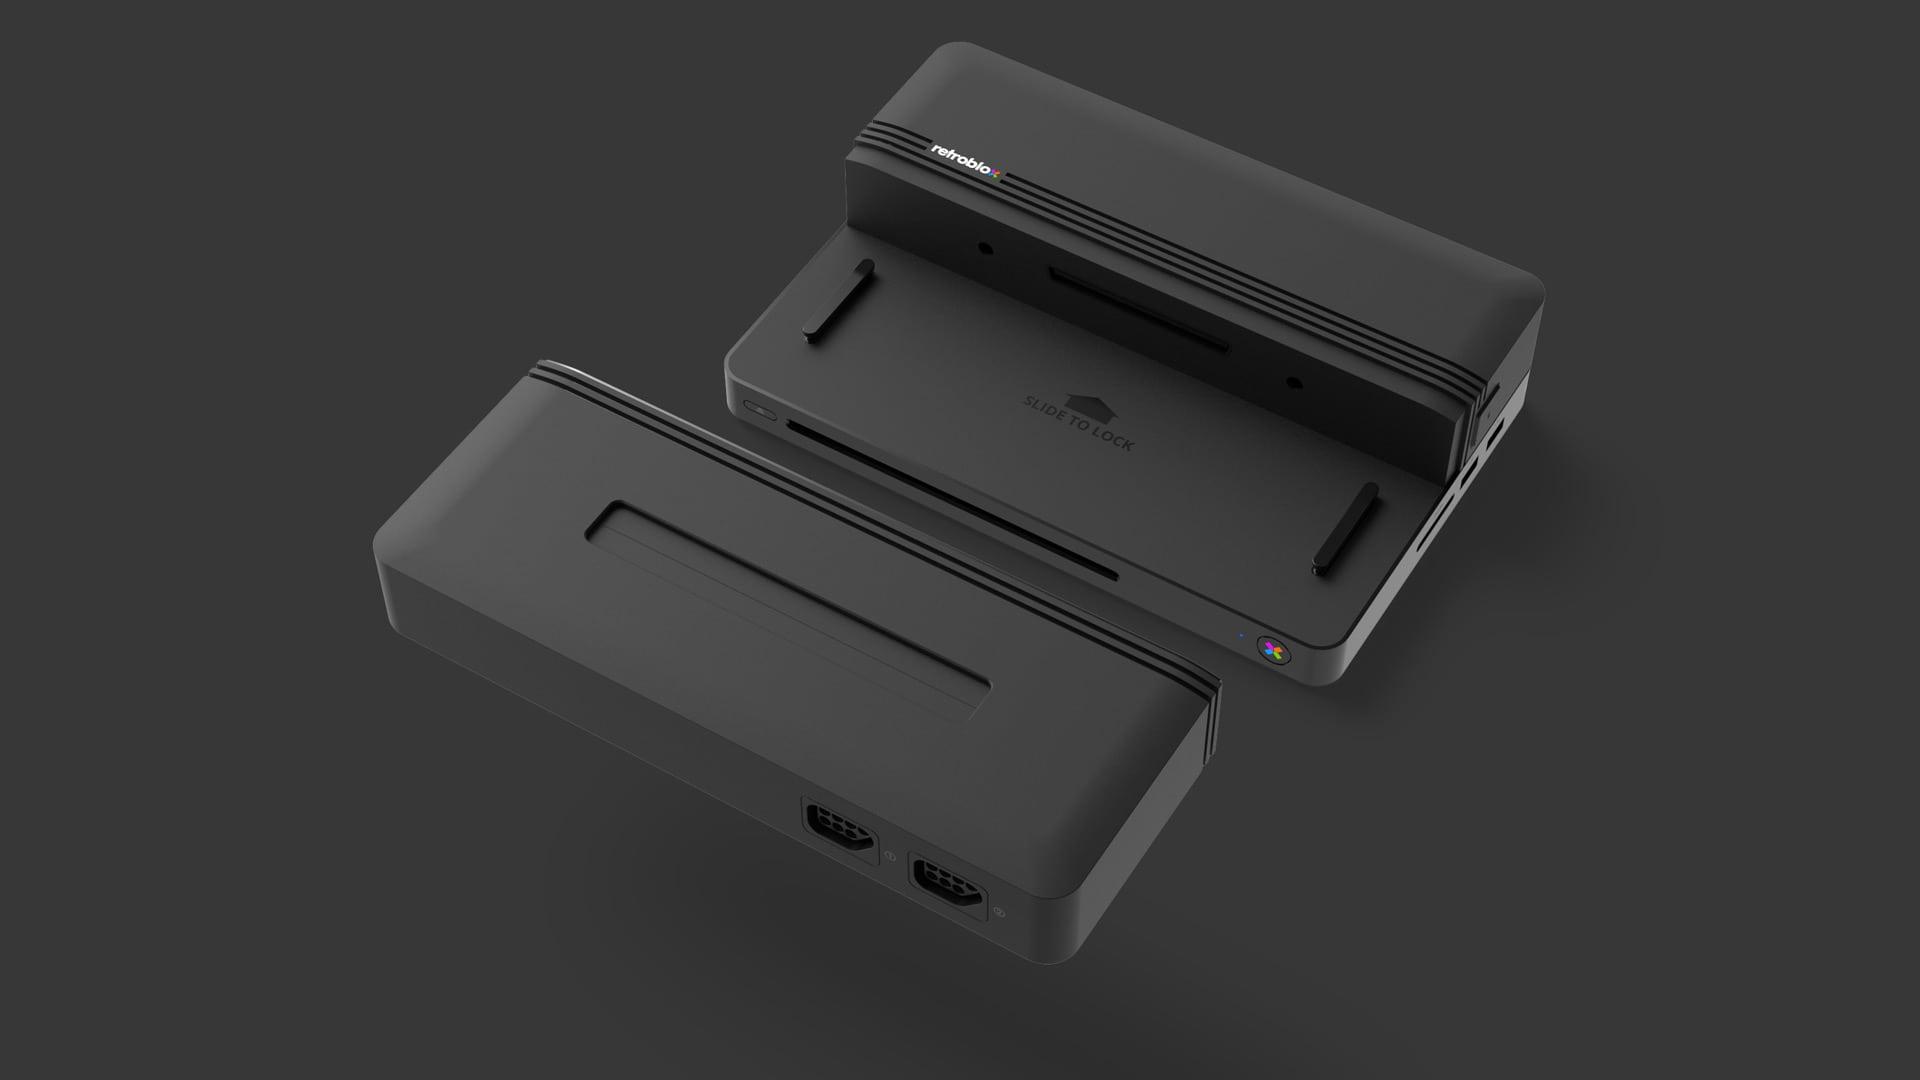 6 rbxpress web - Nowa konsola Polymega ze wsparciem m.in. dla PlayStation oraz Sega Saturn